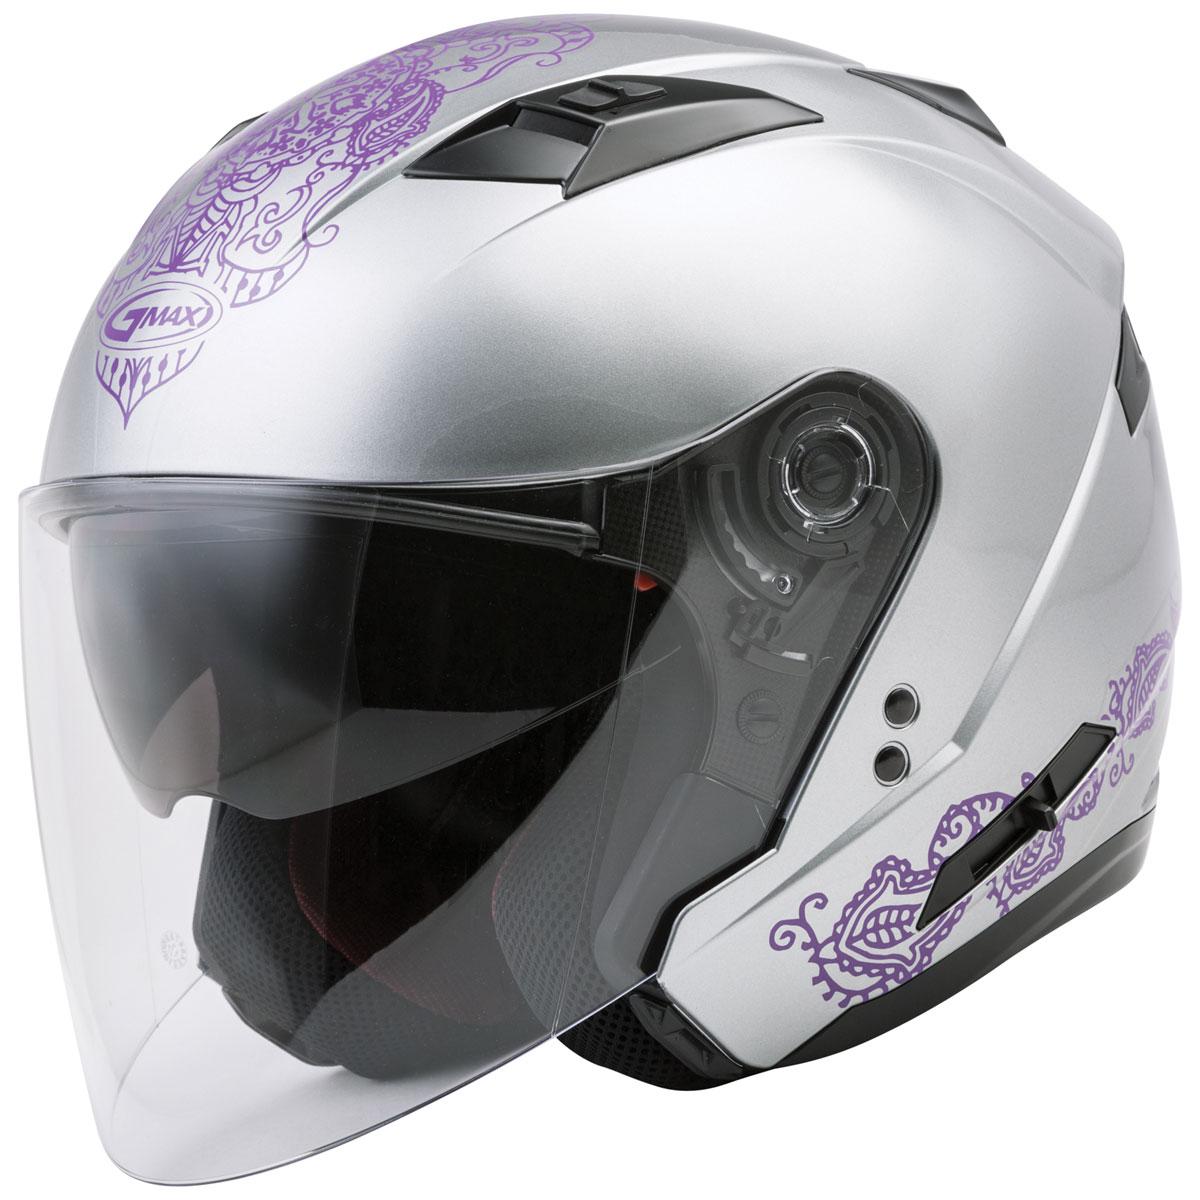 GMAX OF77 Eternal Silver/Violet Open Face Helmet